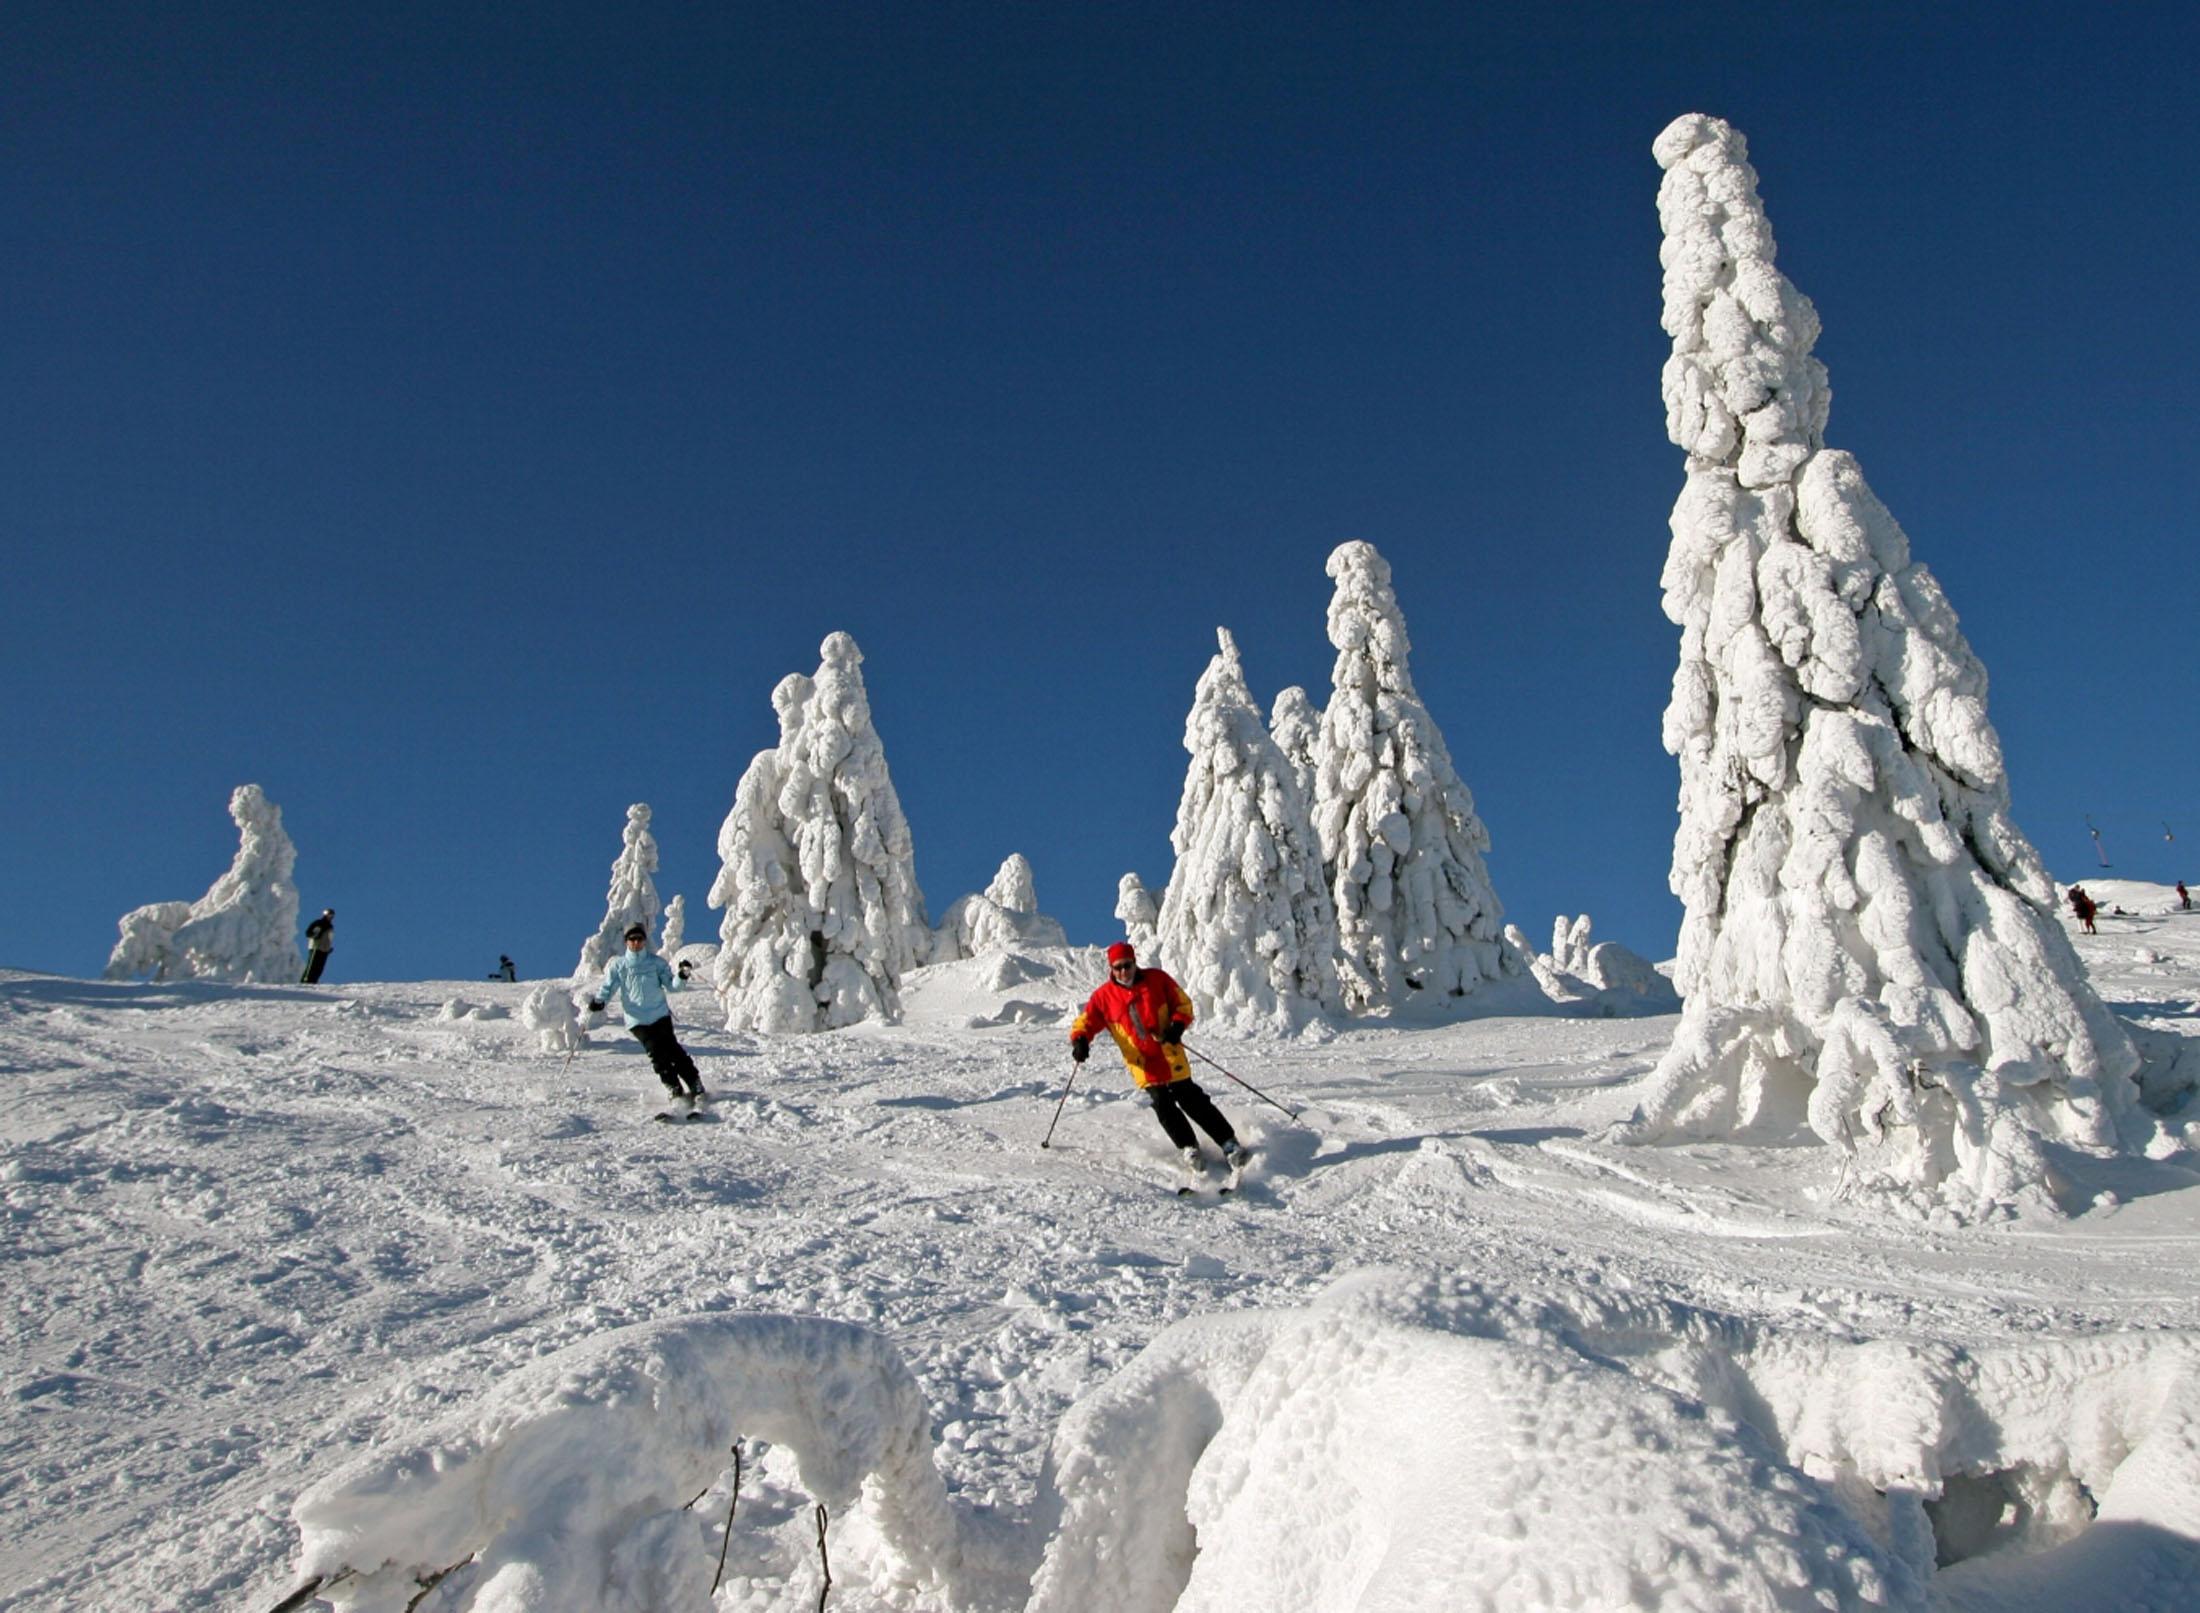 An Eldorado for skiers is the Great Arber - Skivergnügen am Großen Arber